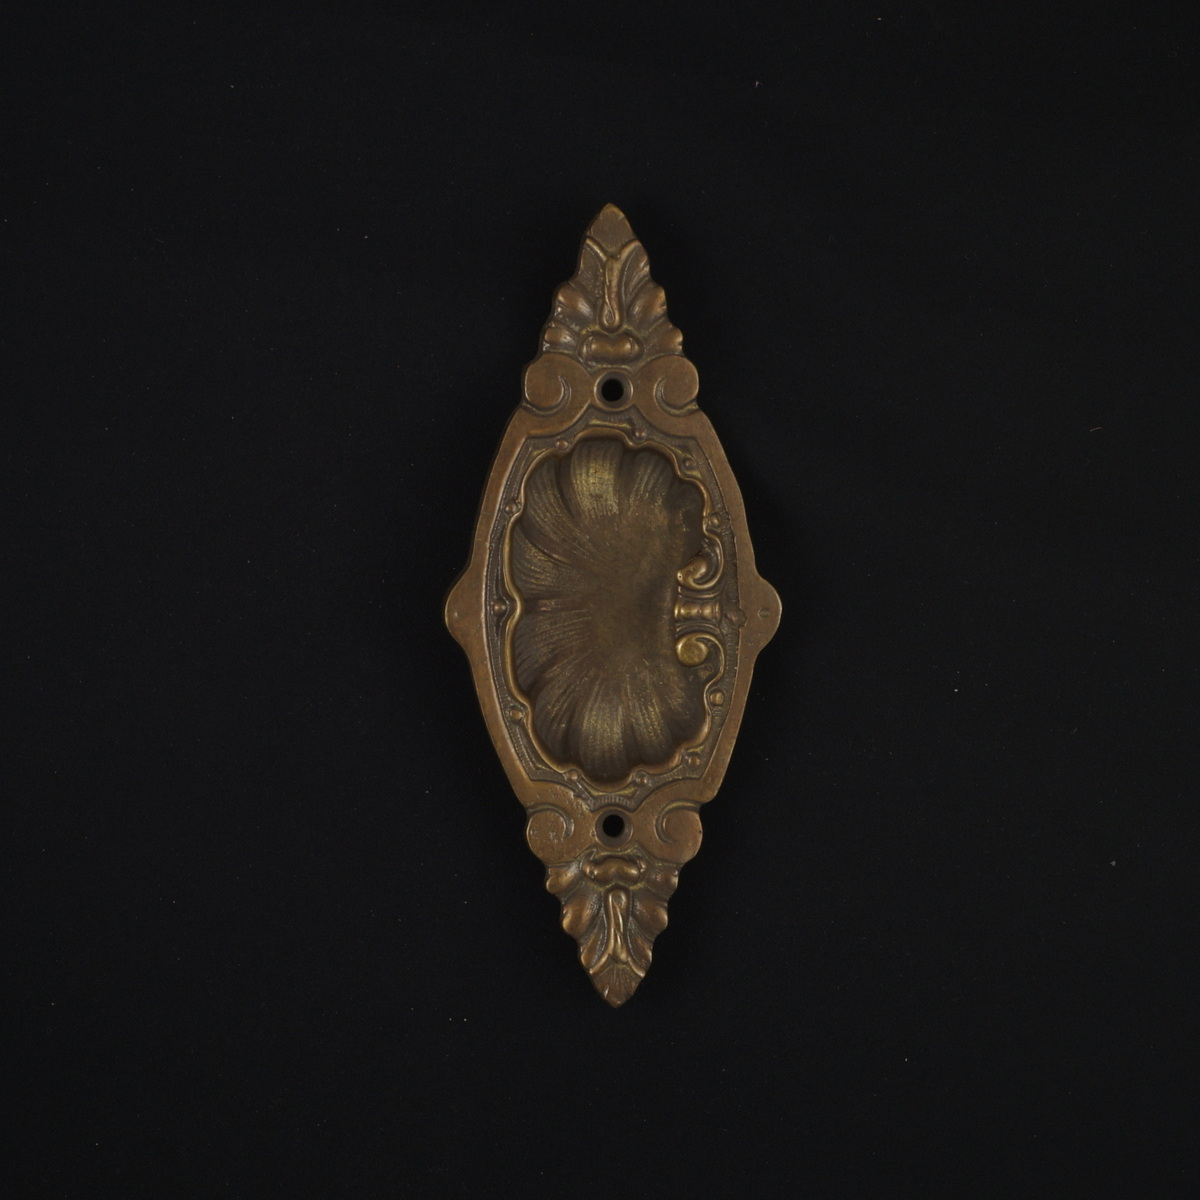 325.0012.45 Schiebetürmuschel - antike Türmuschel